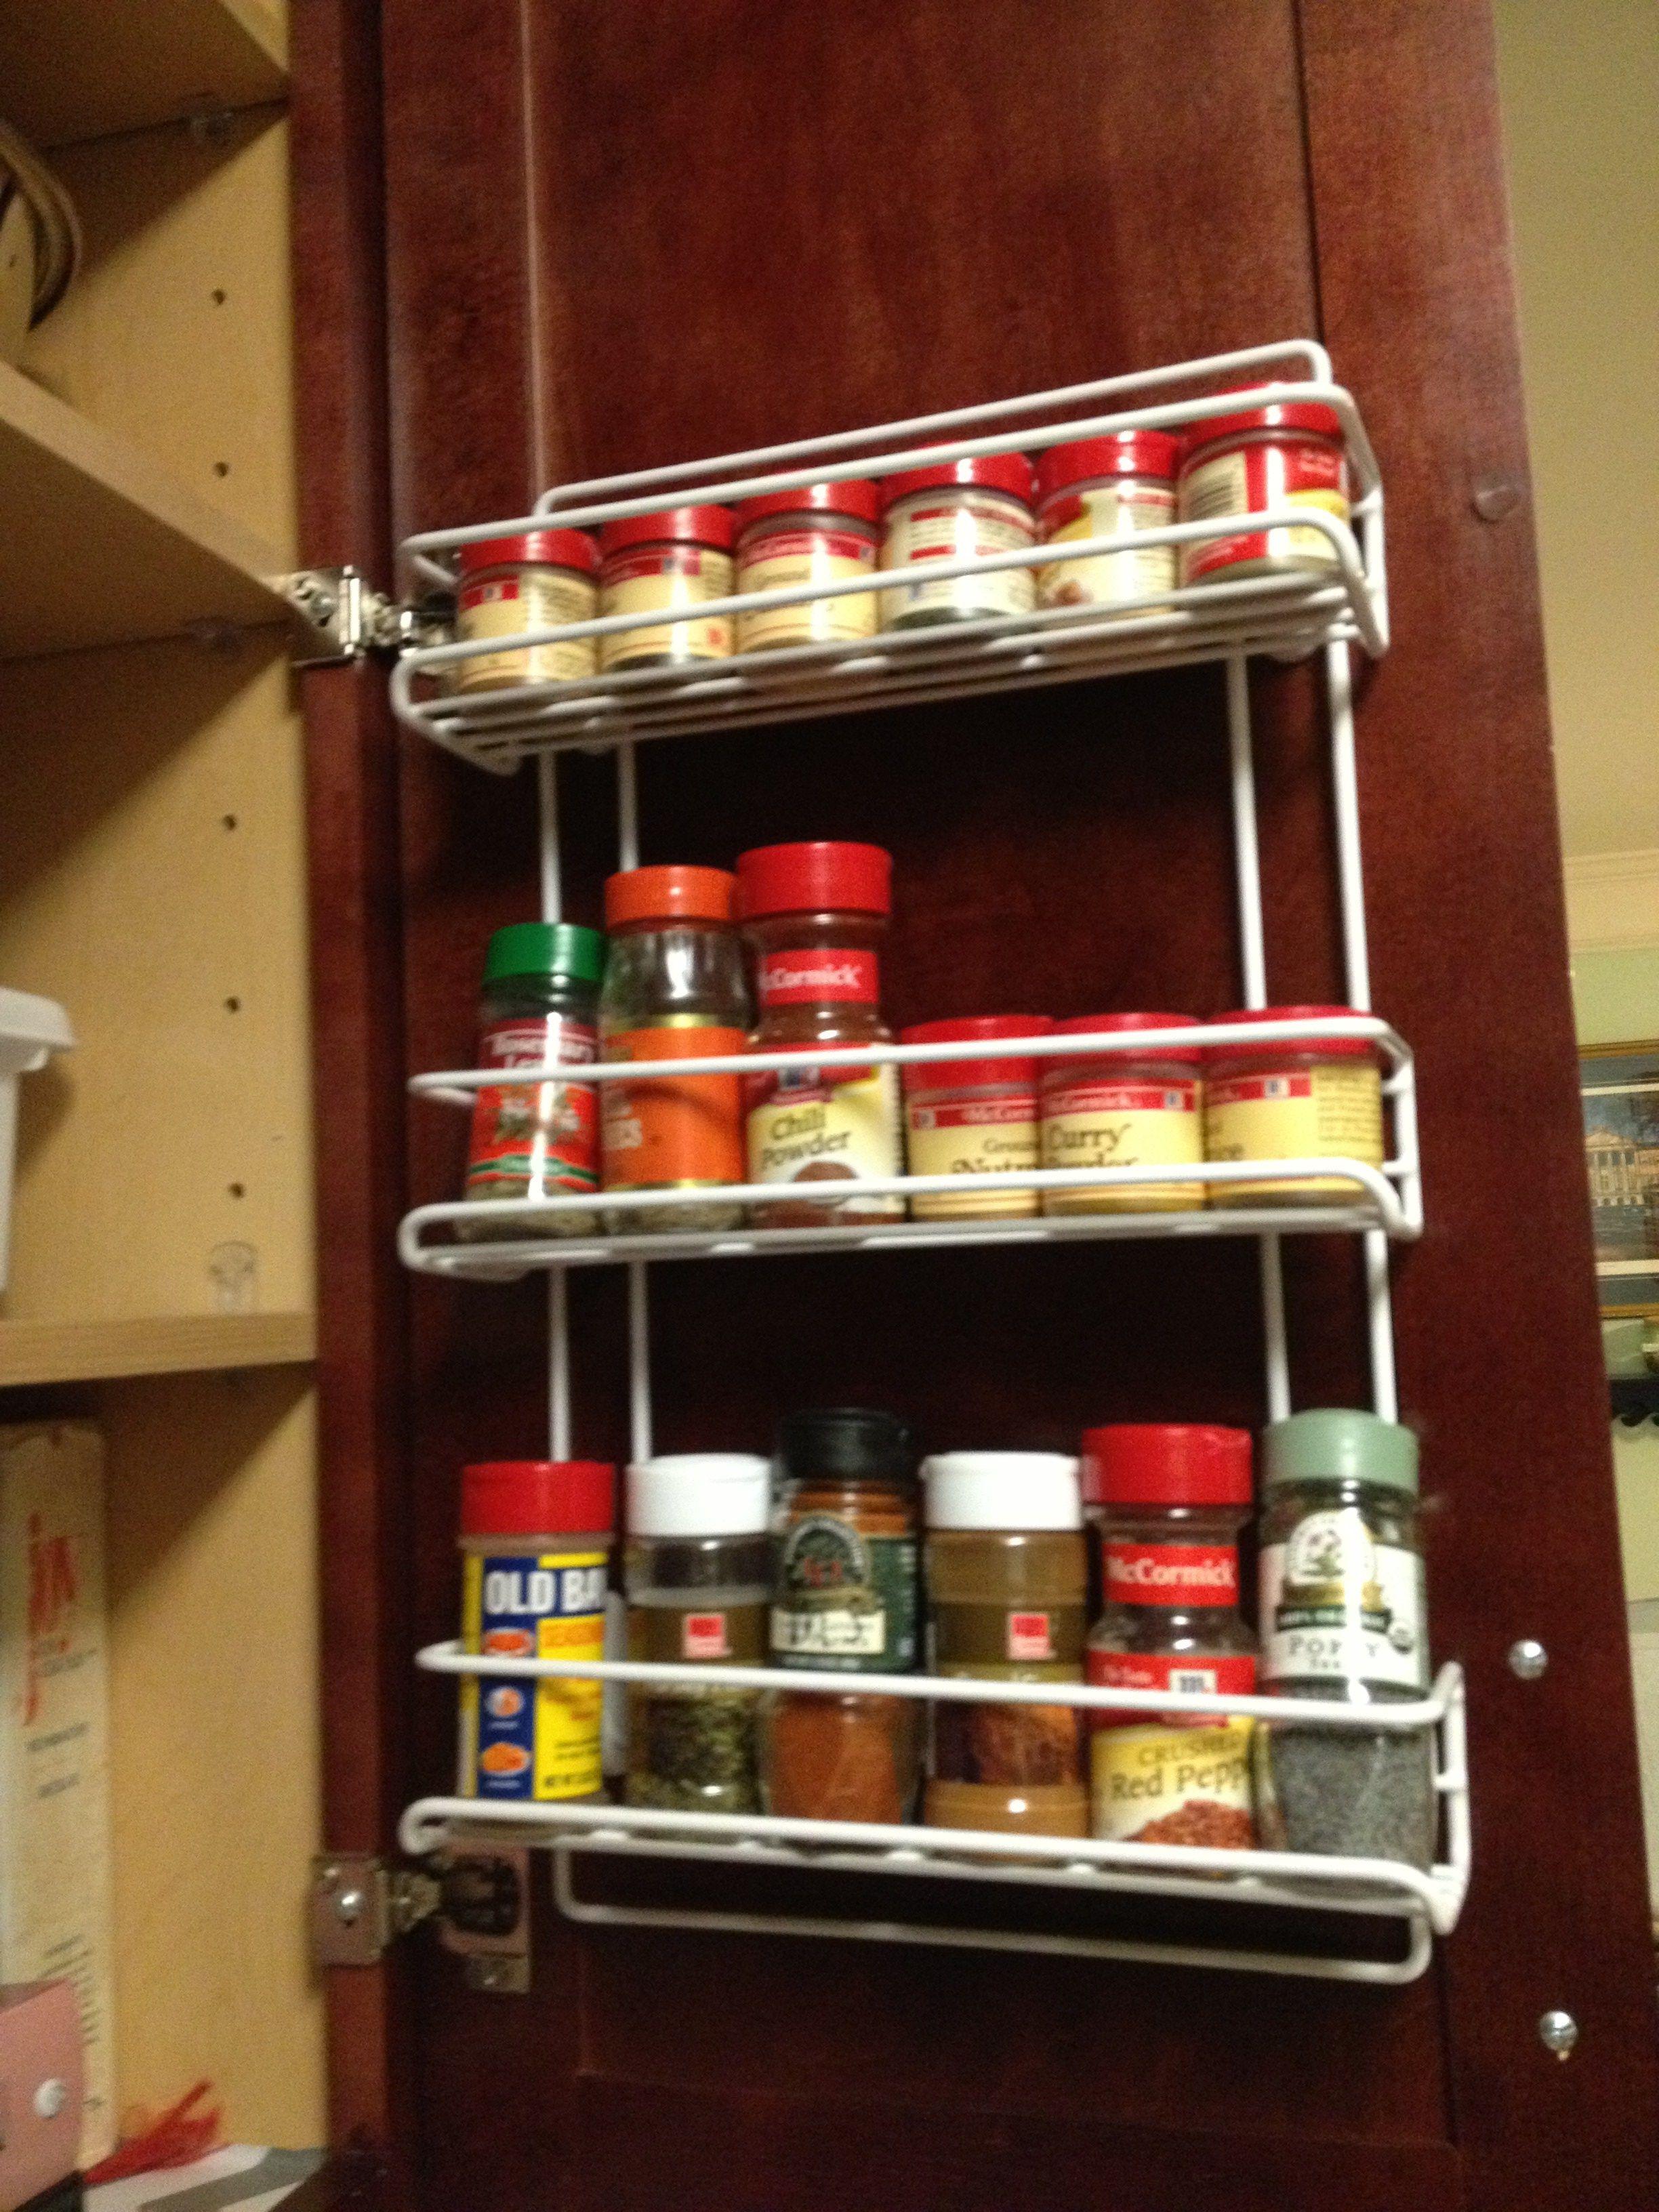 Kitchen Cabinet Spice Organizers cabinets spice racks kitchen cabinets slide spice racks spice rack